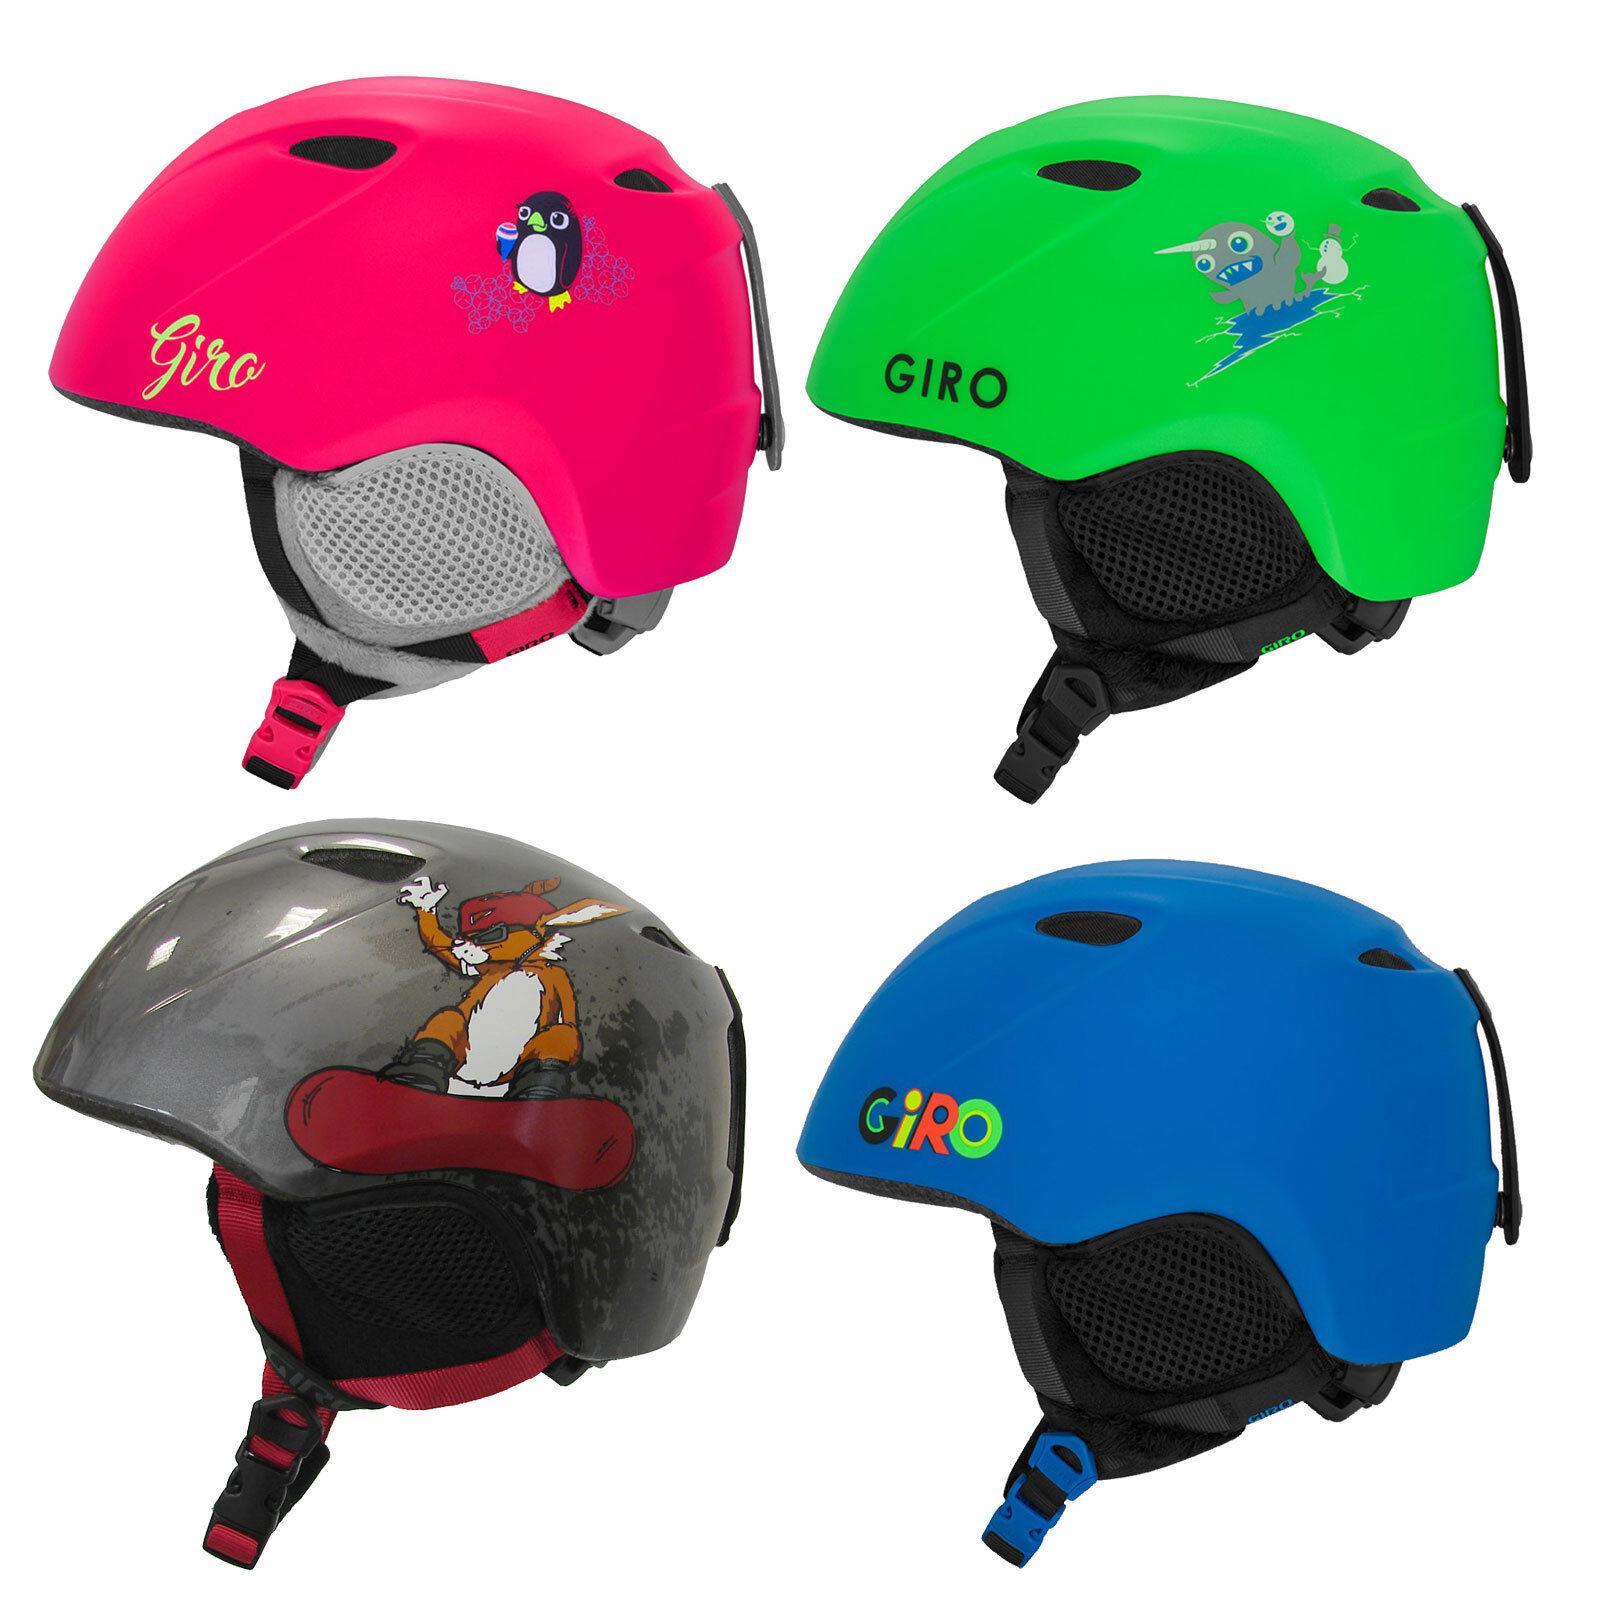 Giro Slingshot Youth Helmet Kinder-Snowboardhelm Ski Winter Schneehelm New